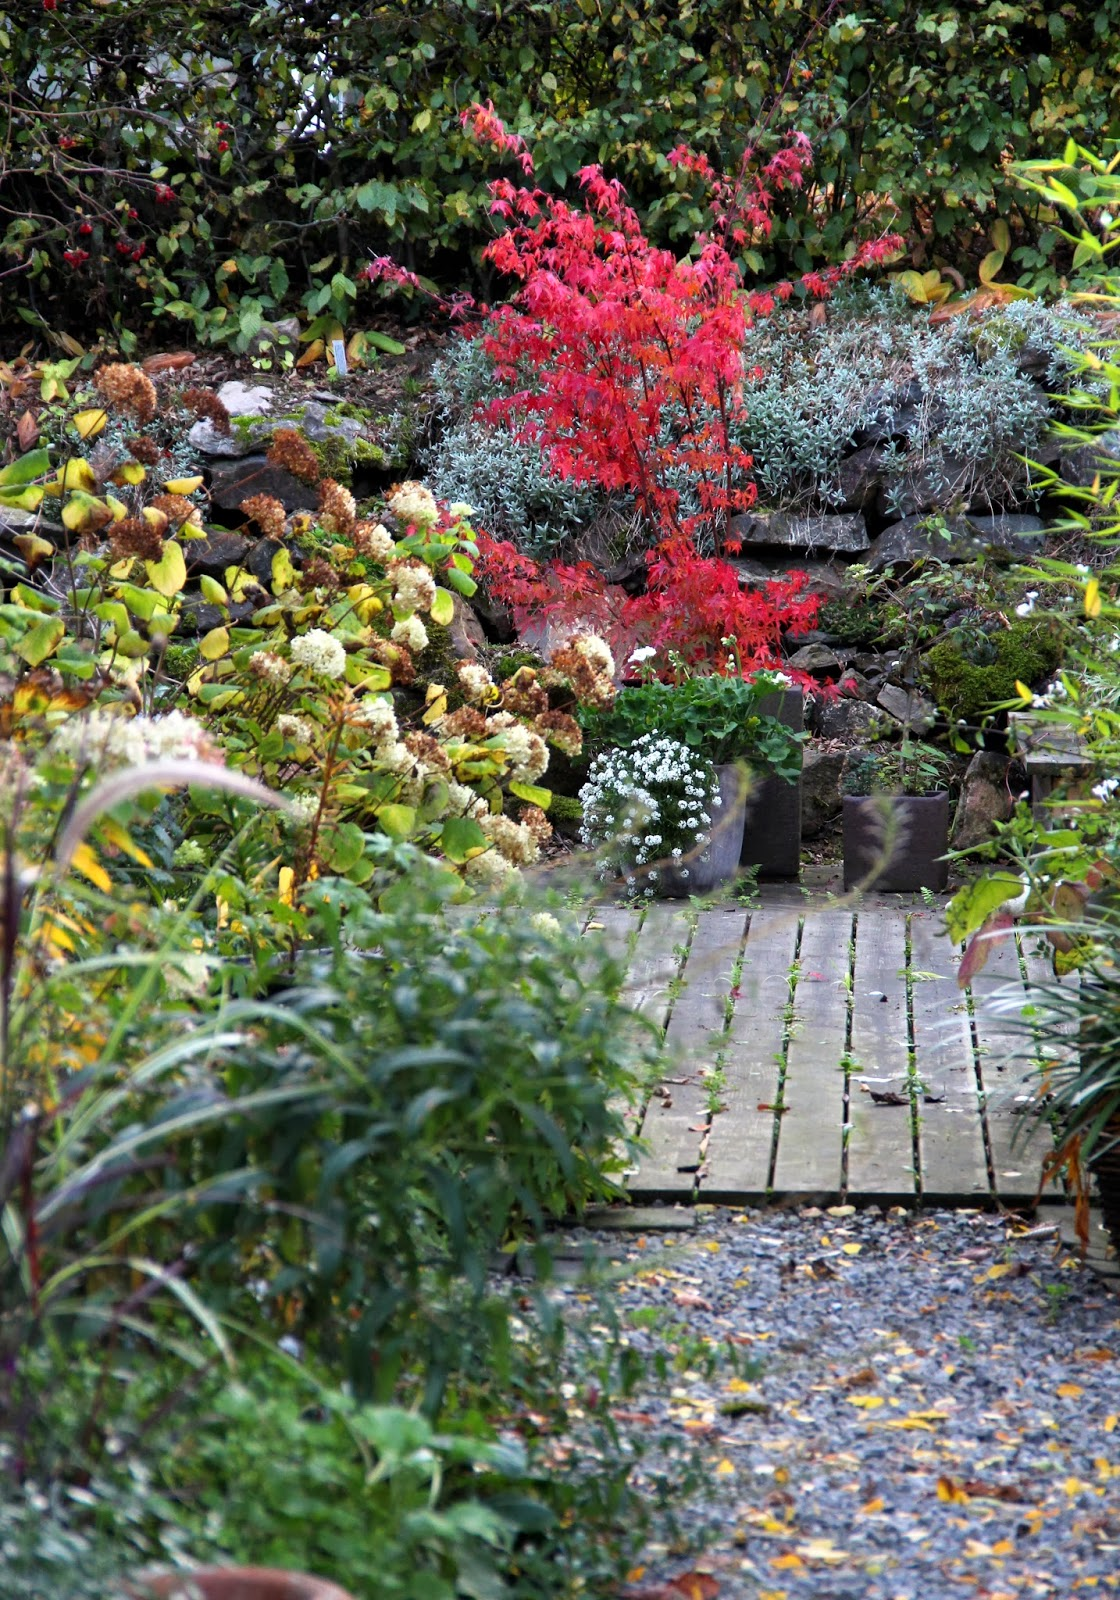 Je suis au jardin la fin des pinards for Dans in jardin